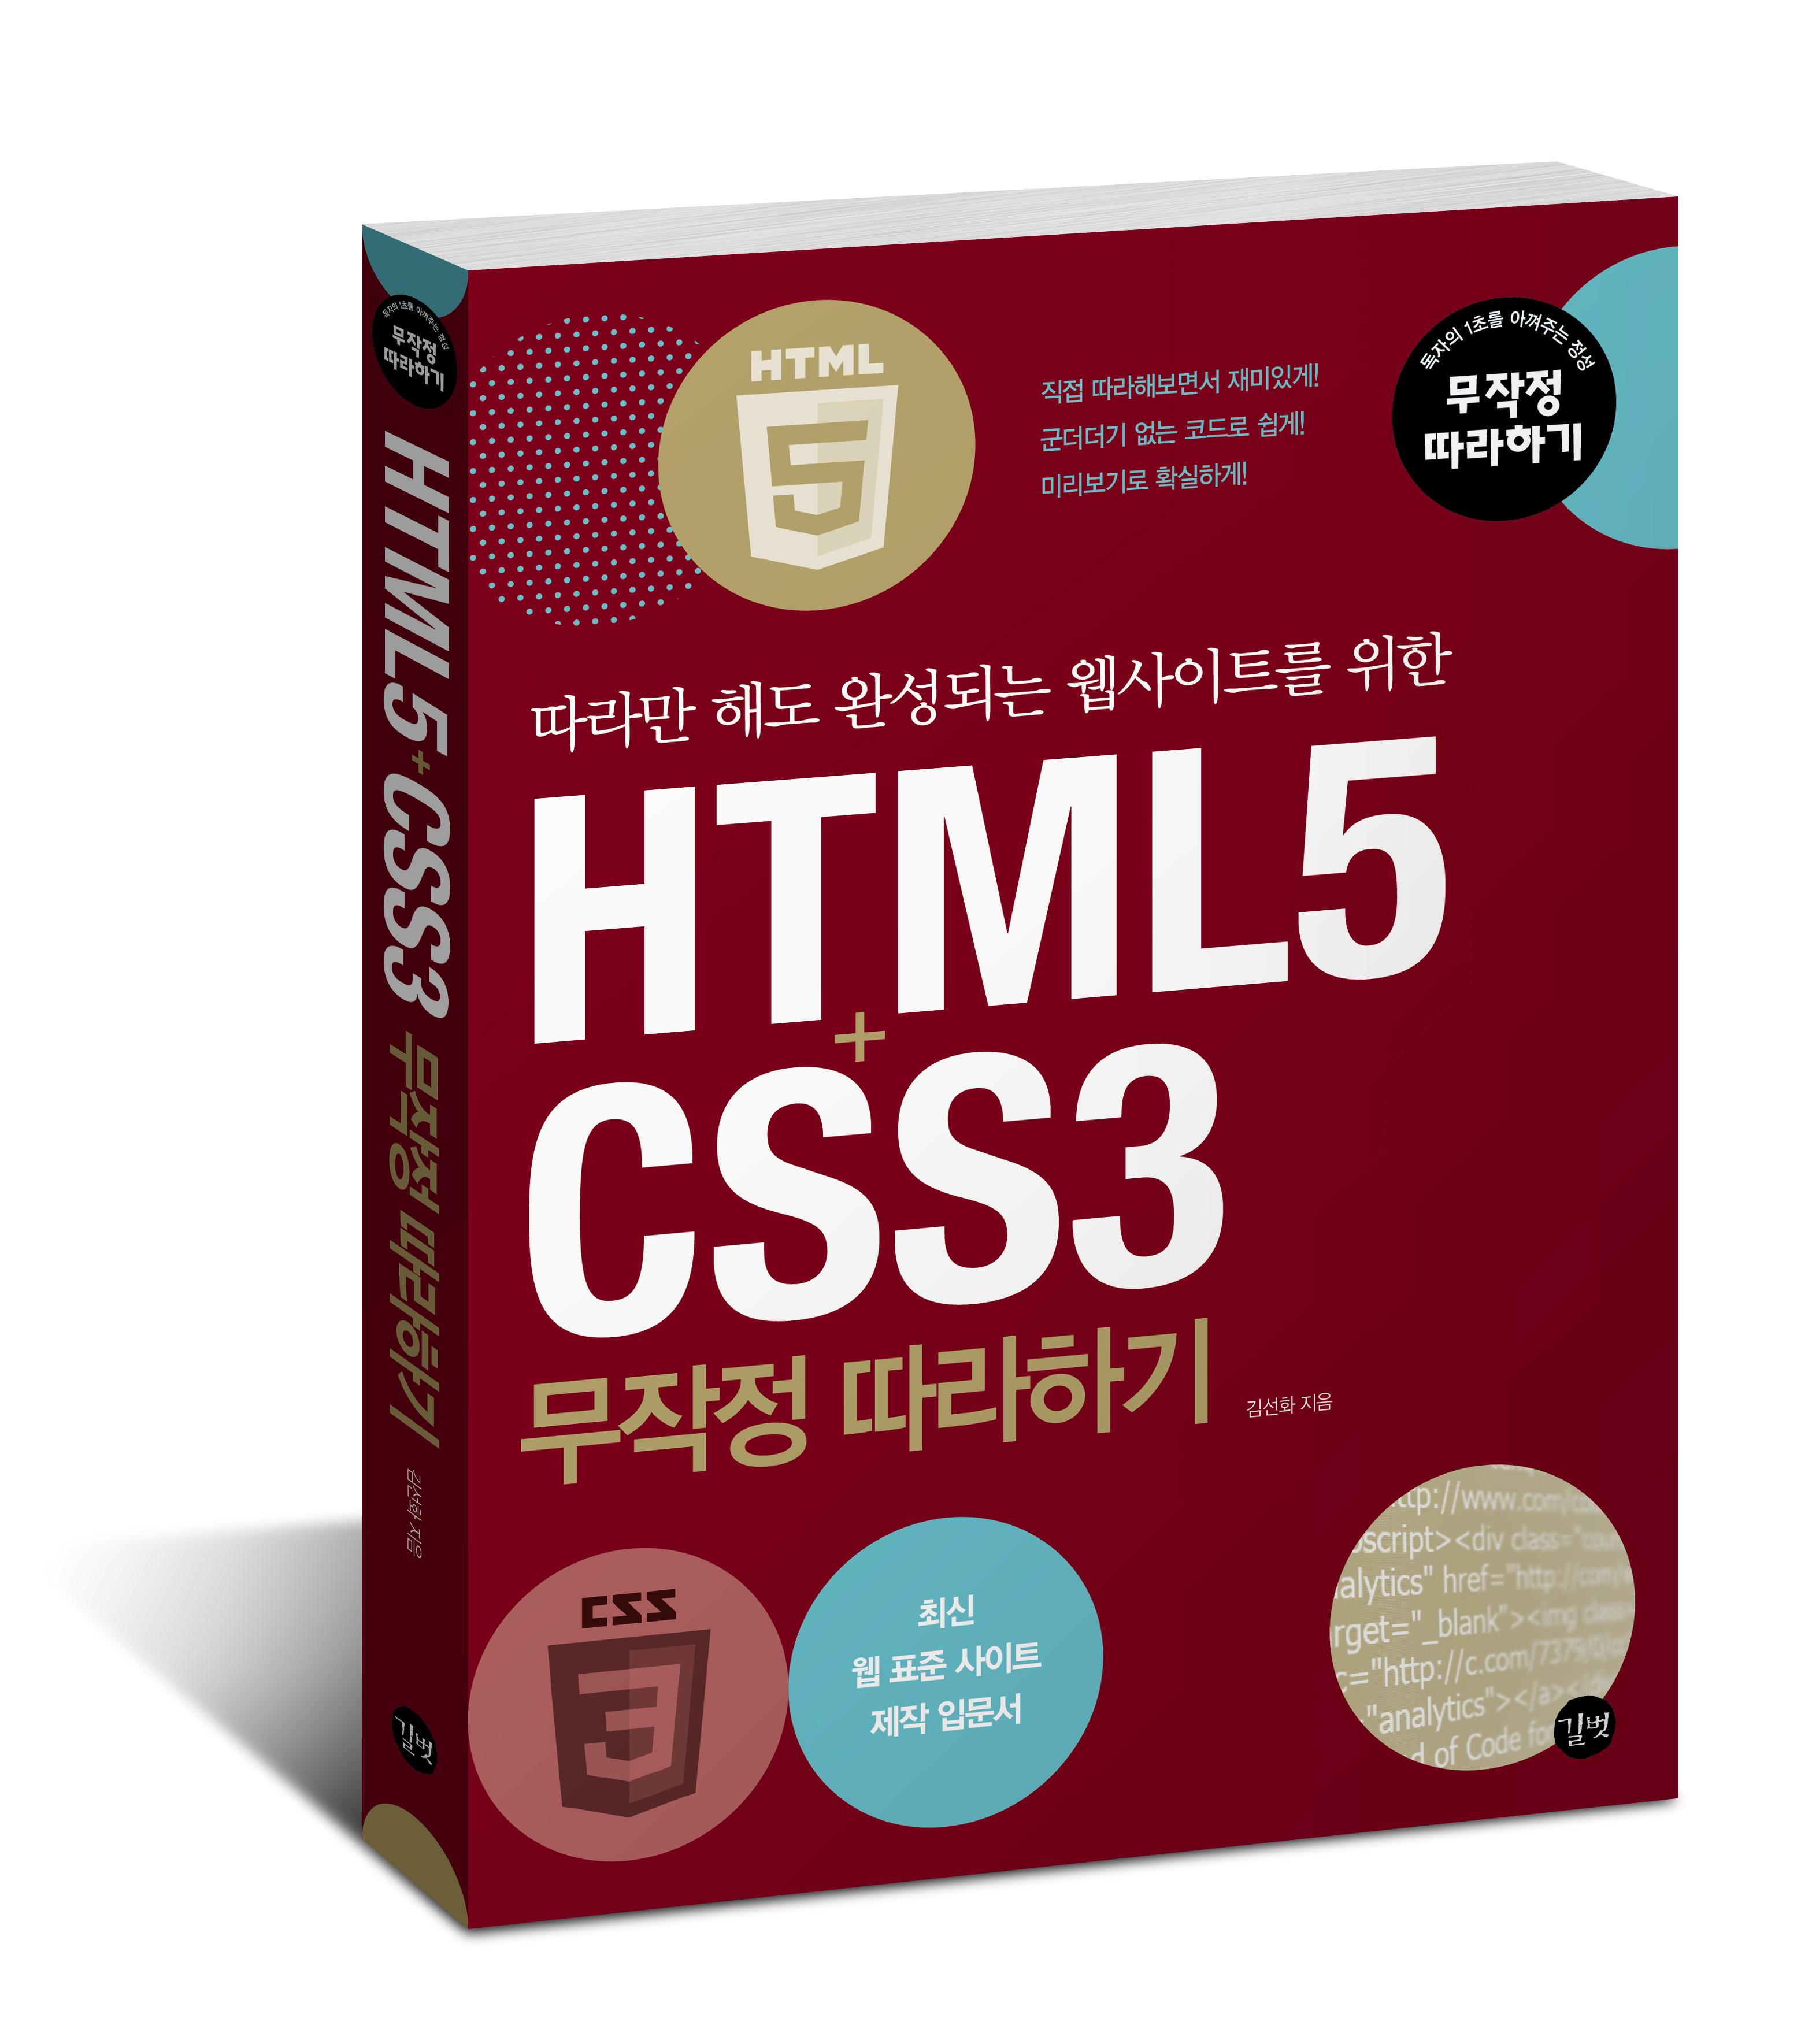 HTML5+CSS3 무작정 따라하기 서평 이벤트 당첨자 발표!